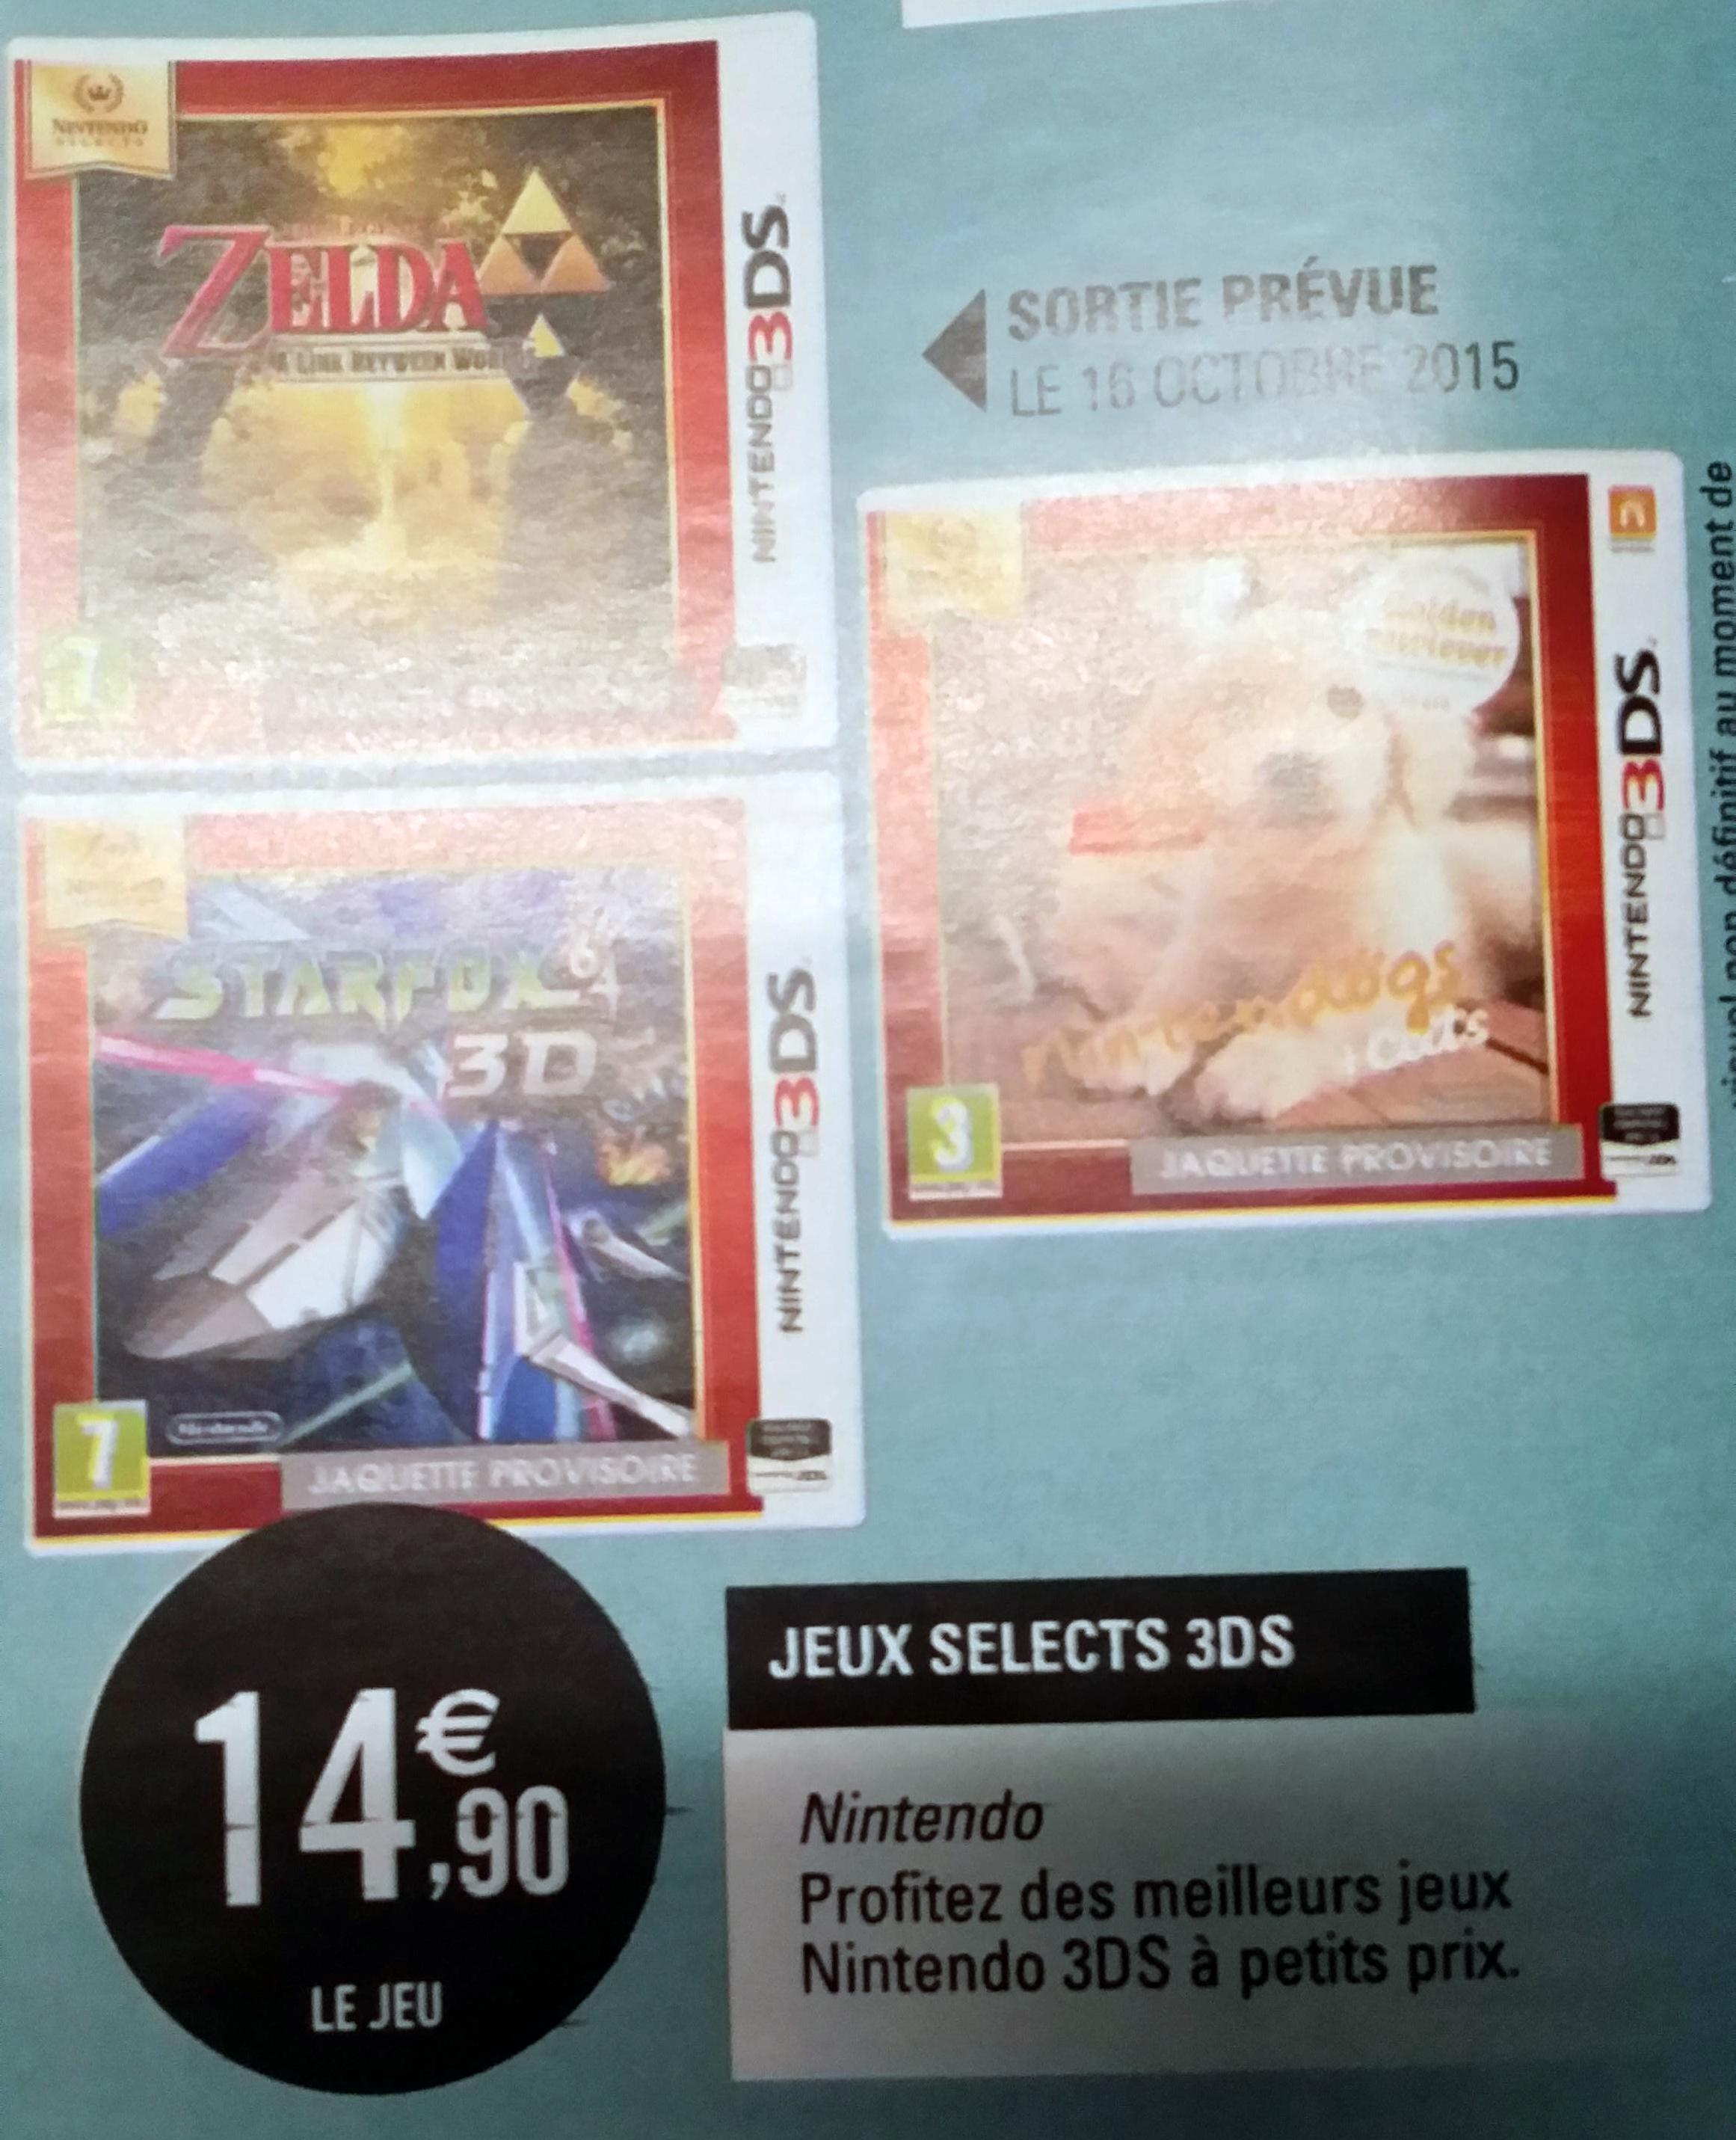 Sélection de Jeux 3DS Select (The Legend of Zelda : A Link Between Worlds, Starfox, Nintendogs...)